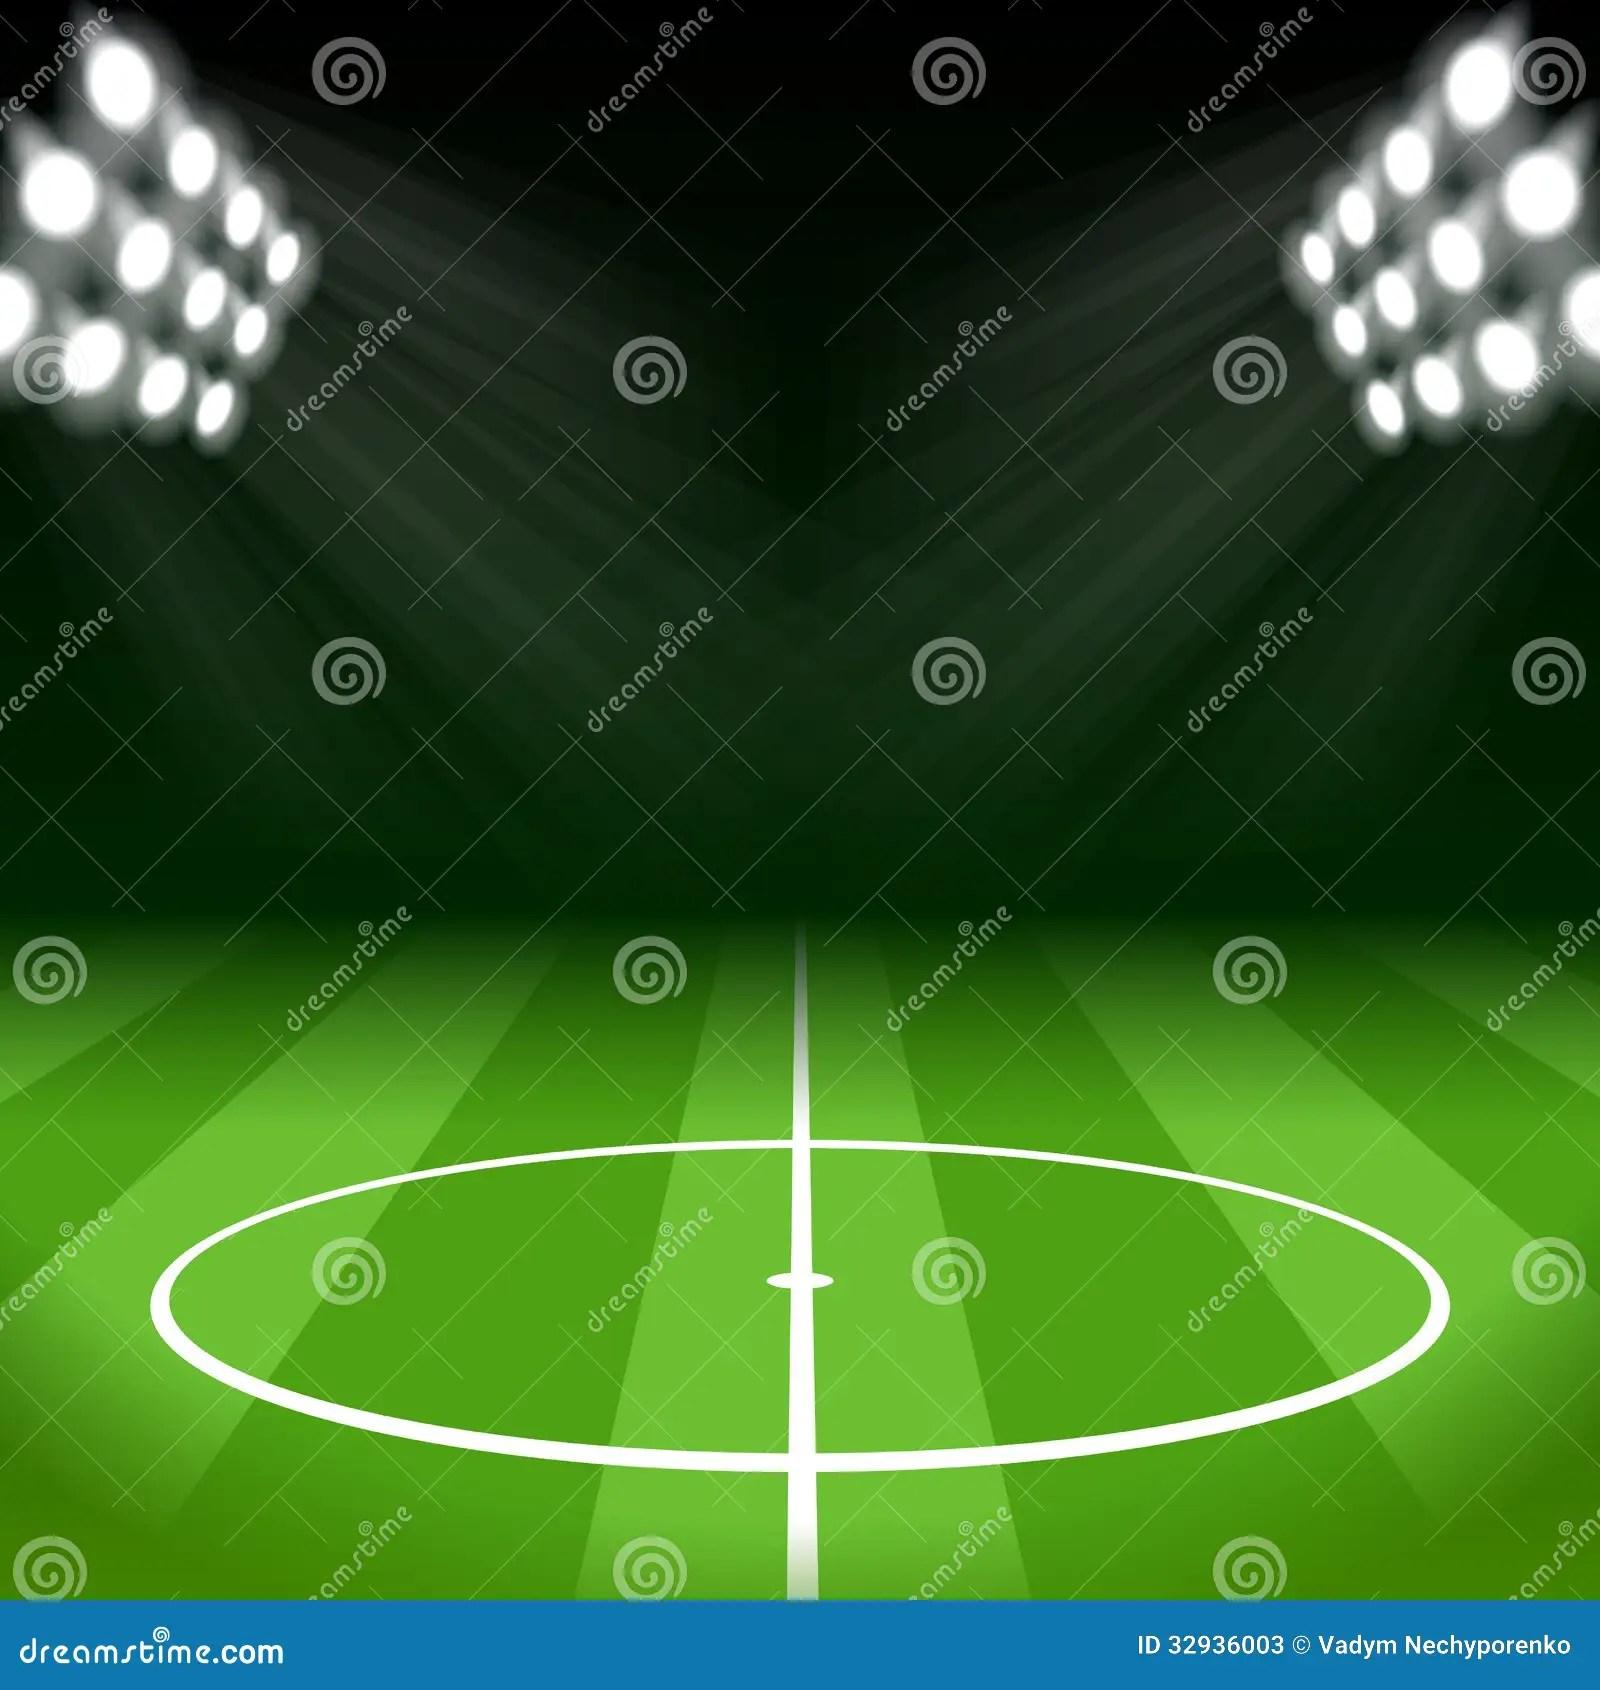 Background Football Field